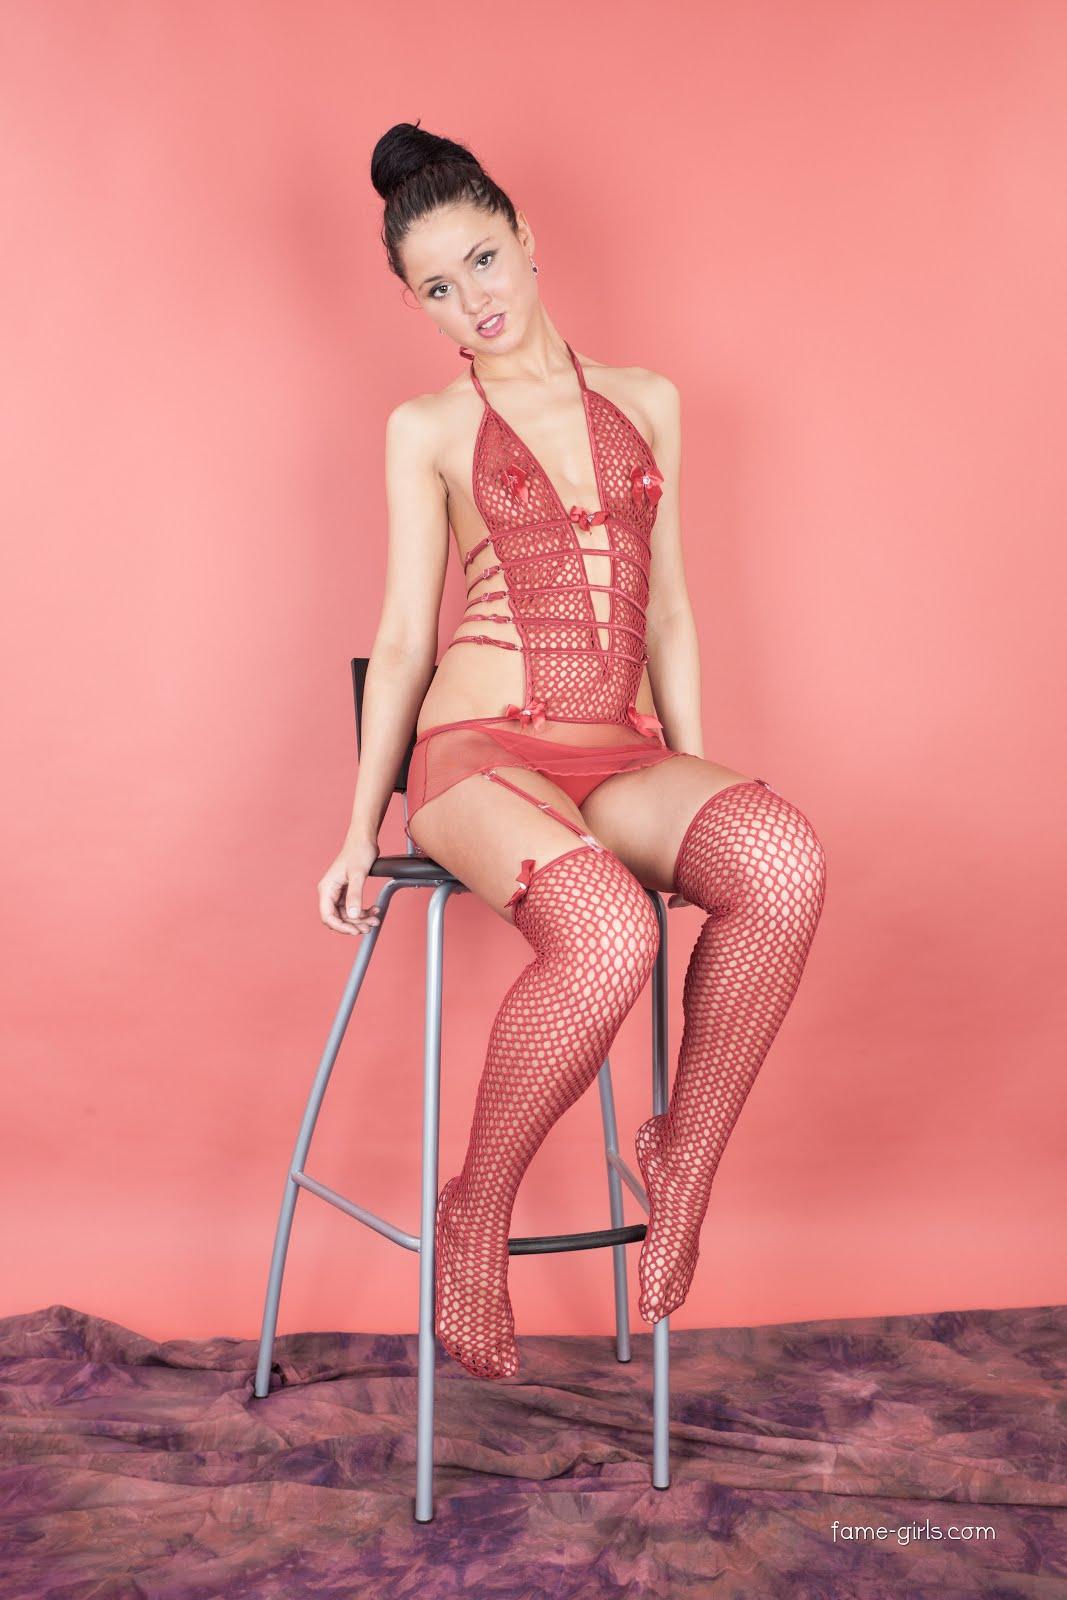 vladmodels full nude   hot girls wallpaper